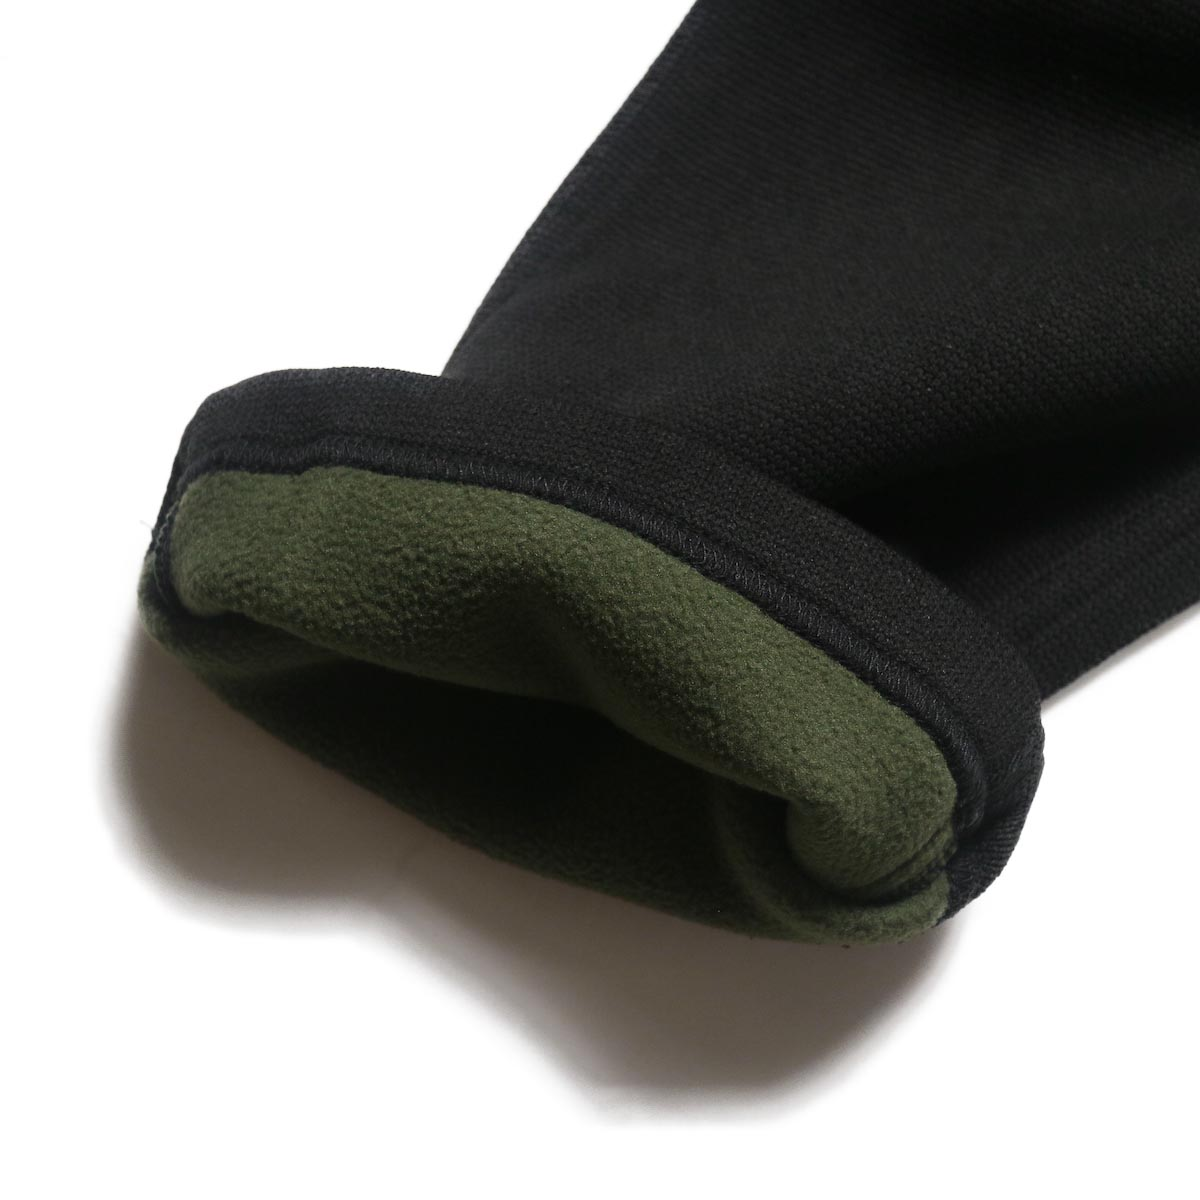 GRAMICCI / BONDING KNIT FLEECE NN-PANTS JUST CUT (Black)フリース素材